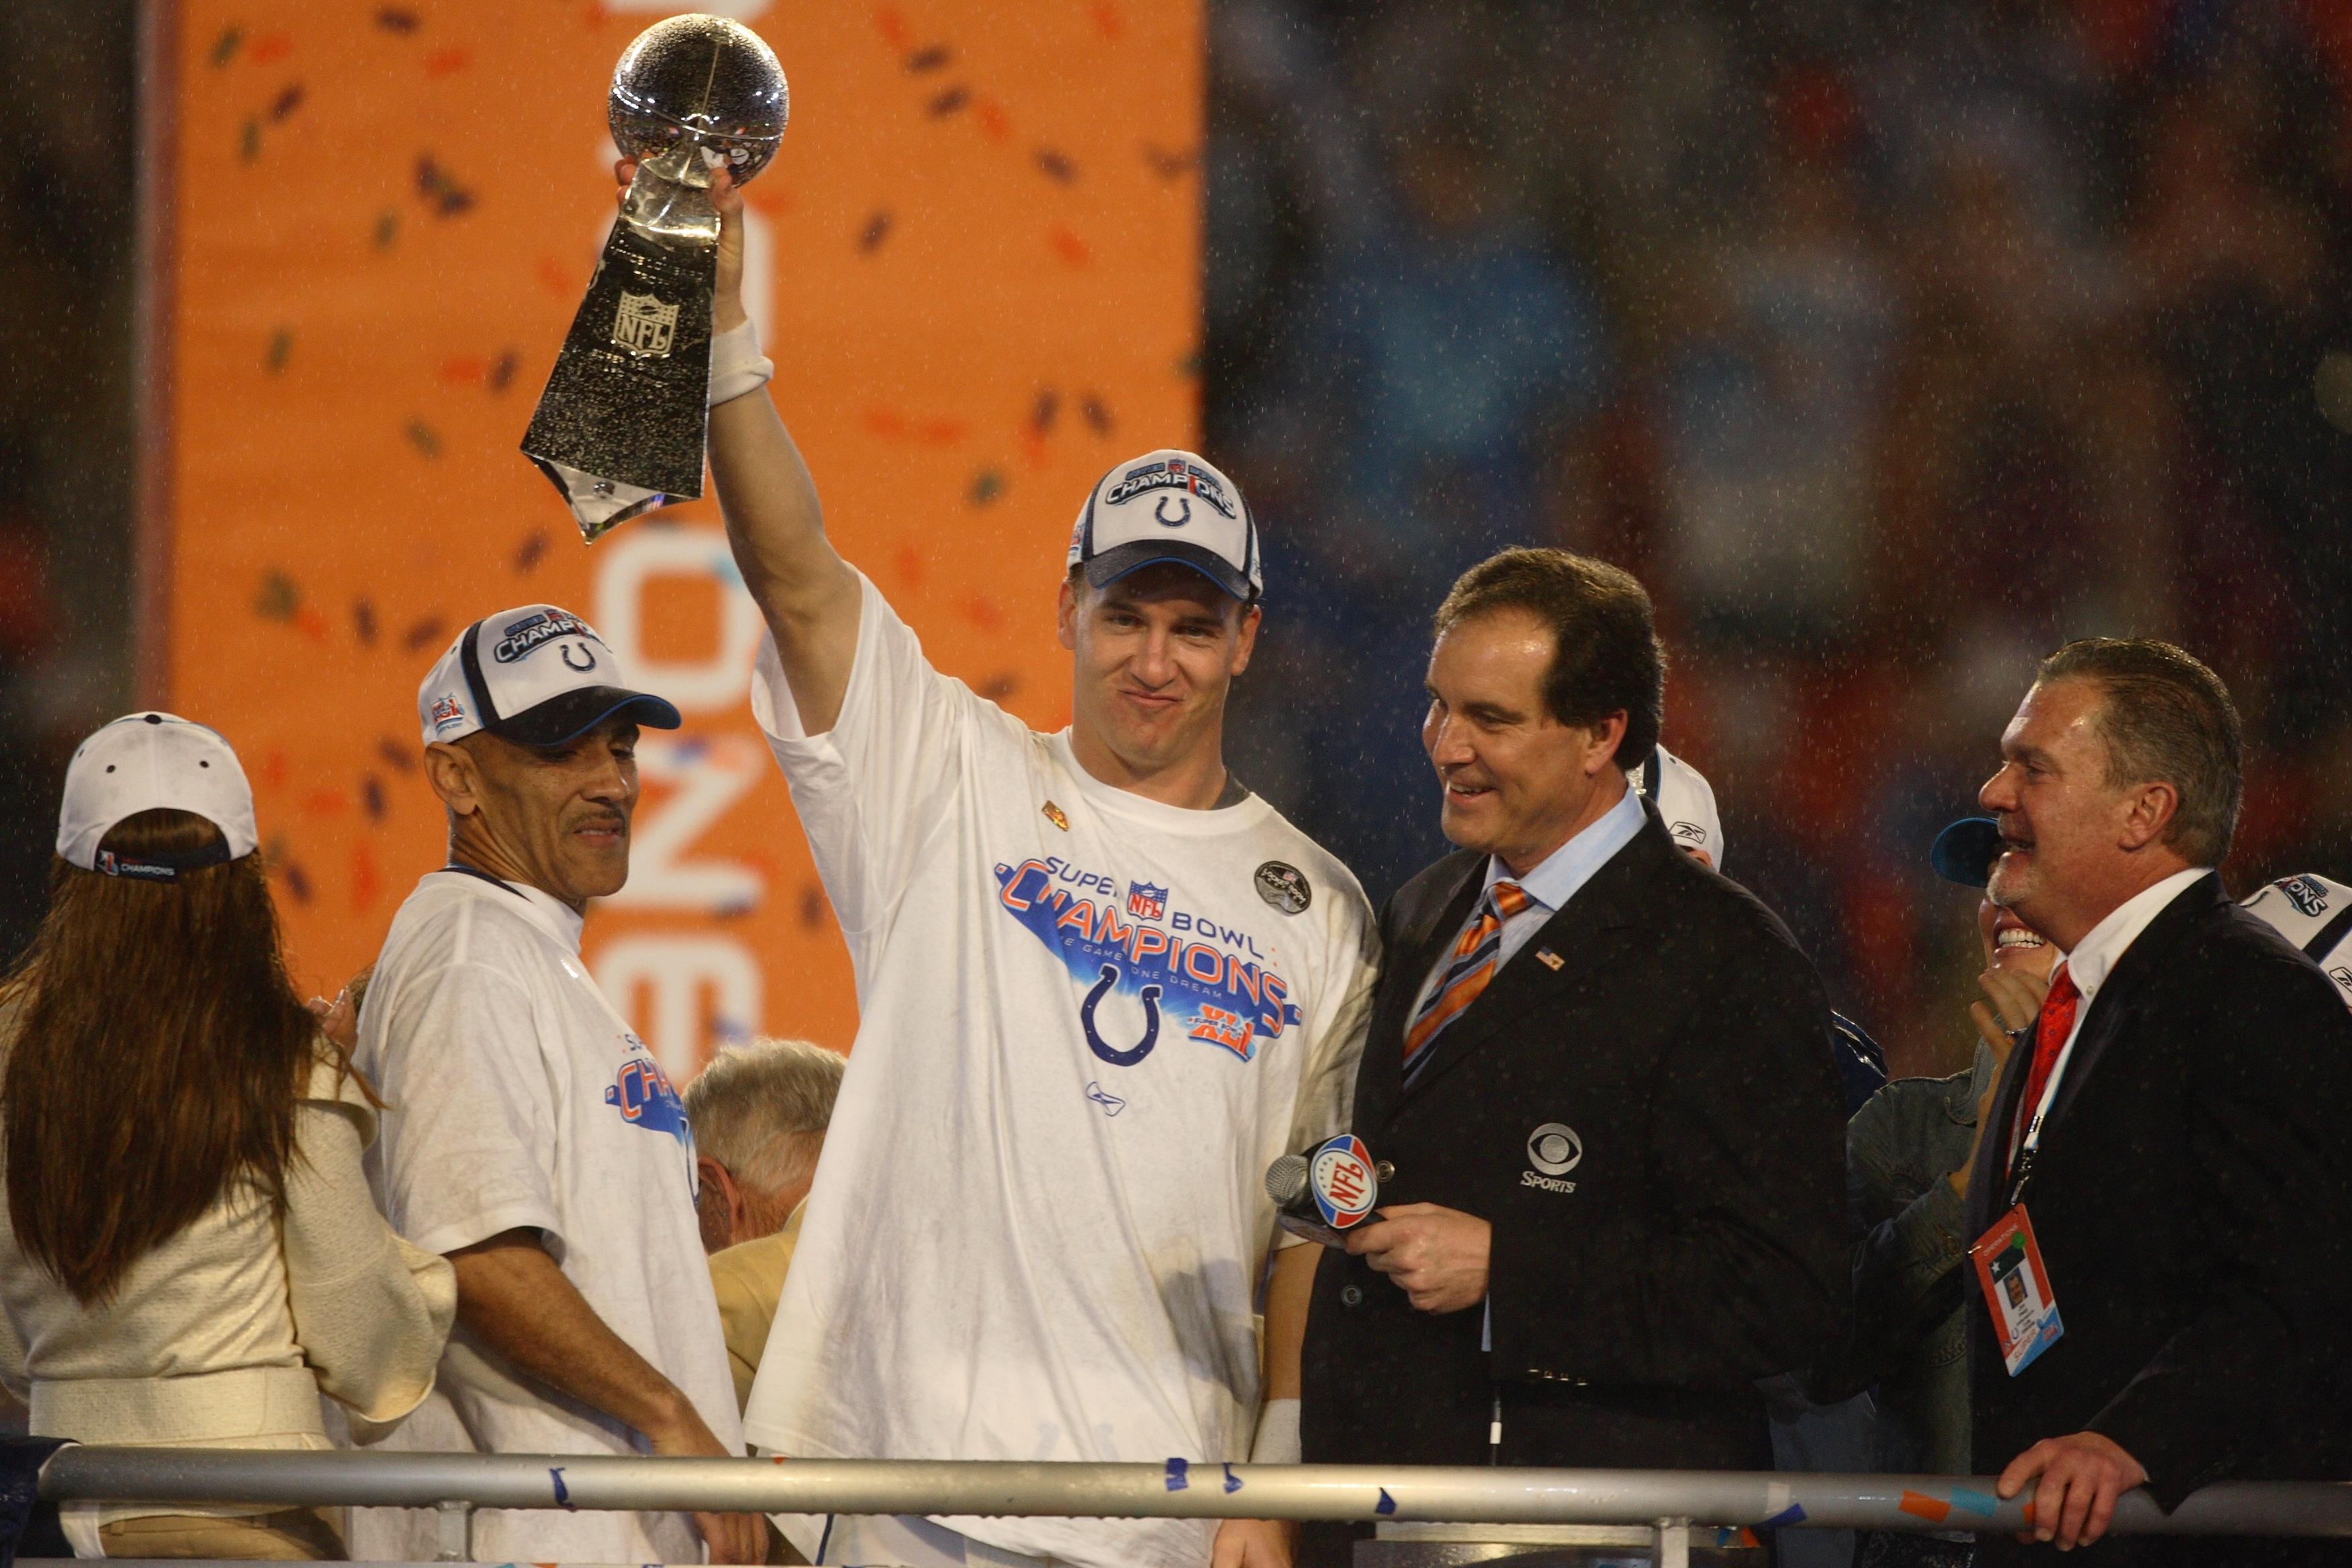 The Manning, The Myth, The Legend   Nfl regarding Peyton Manning Super Bowl